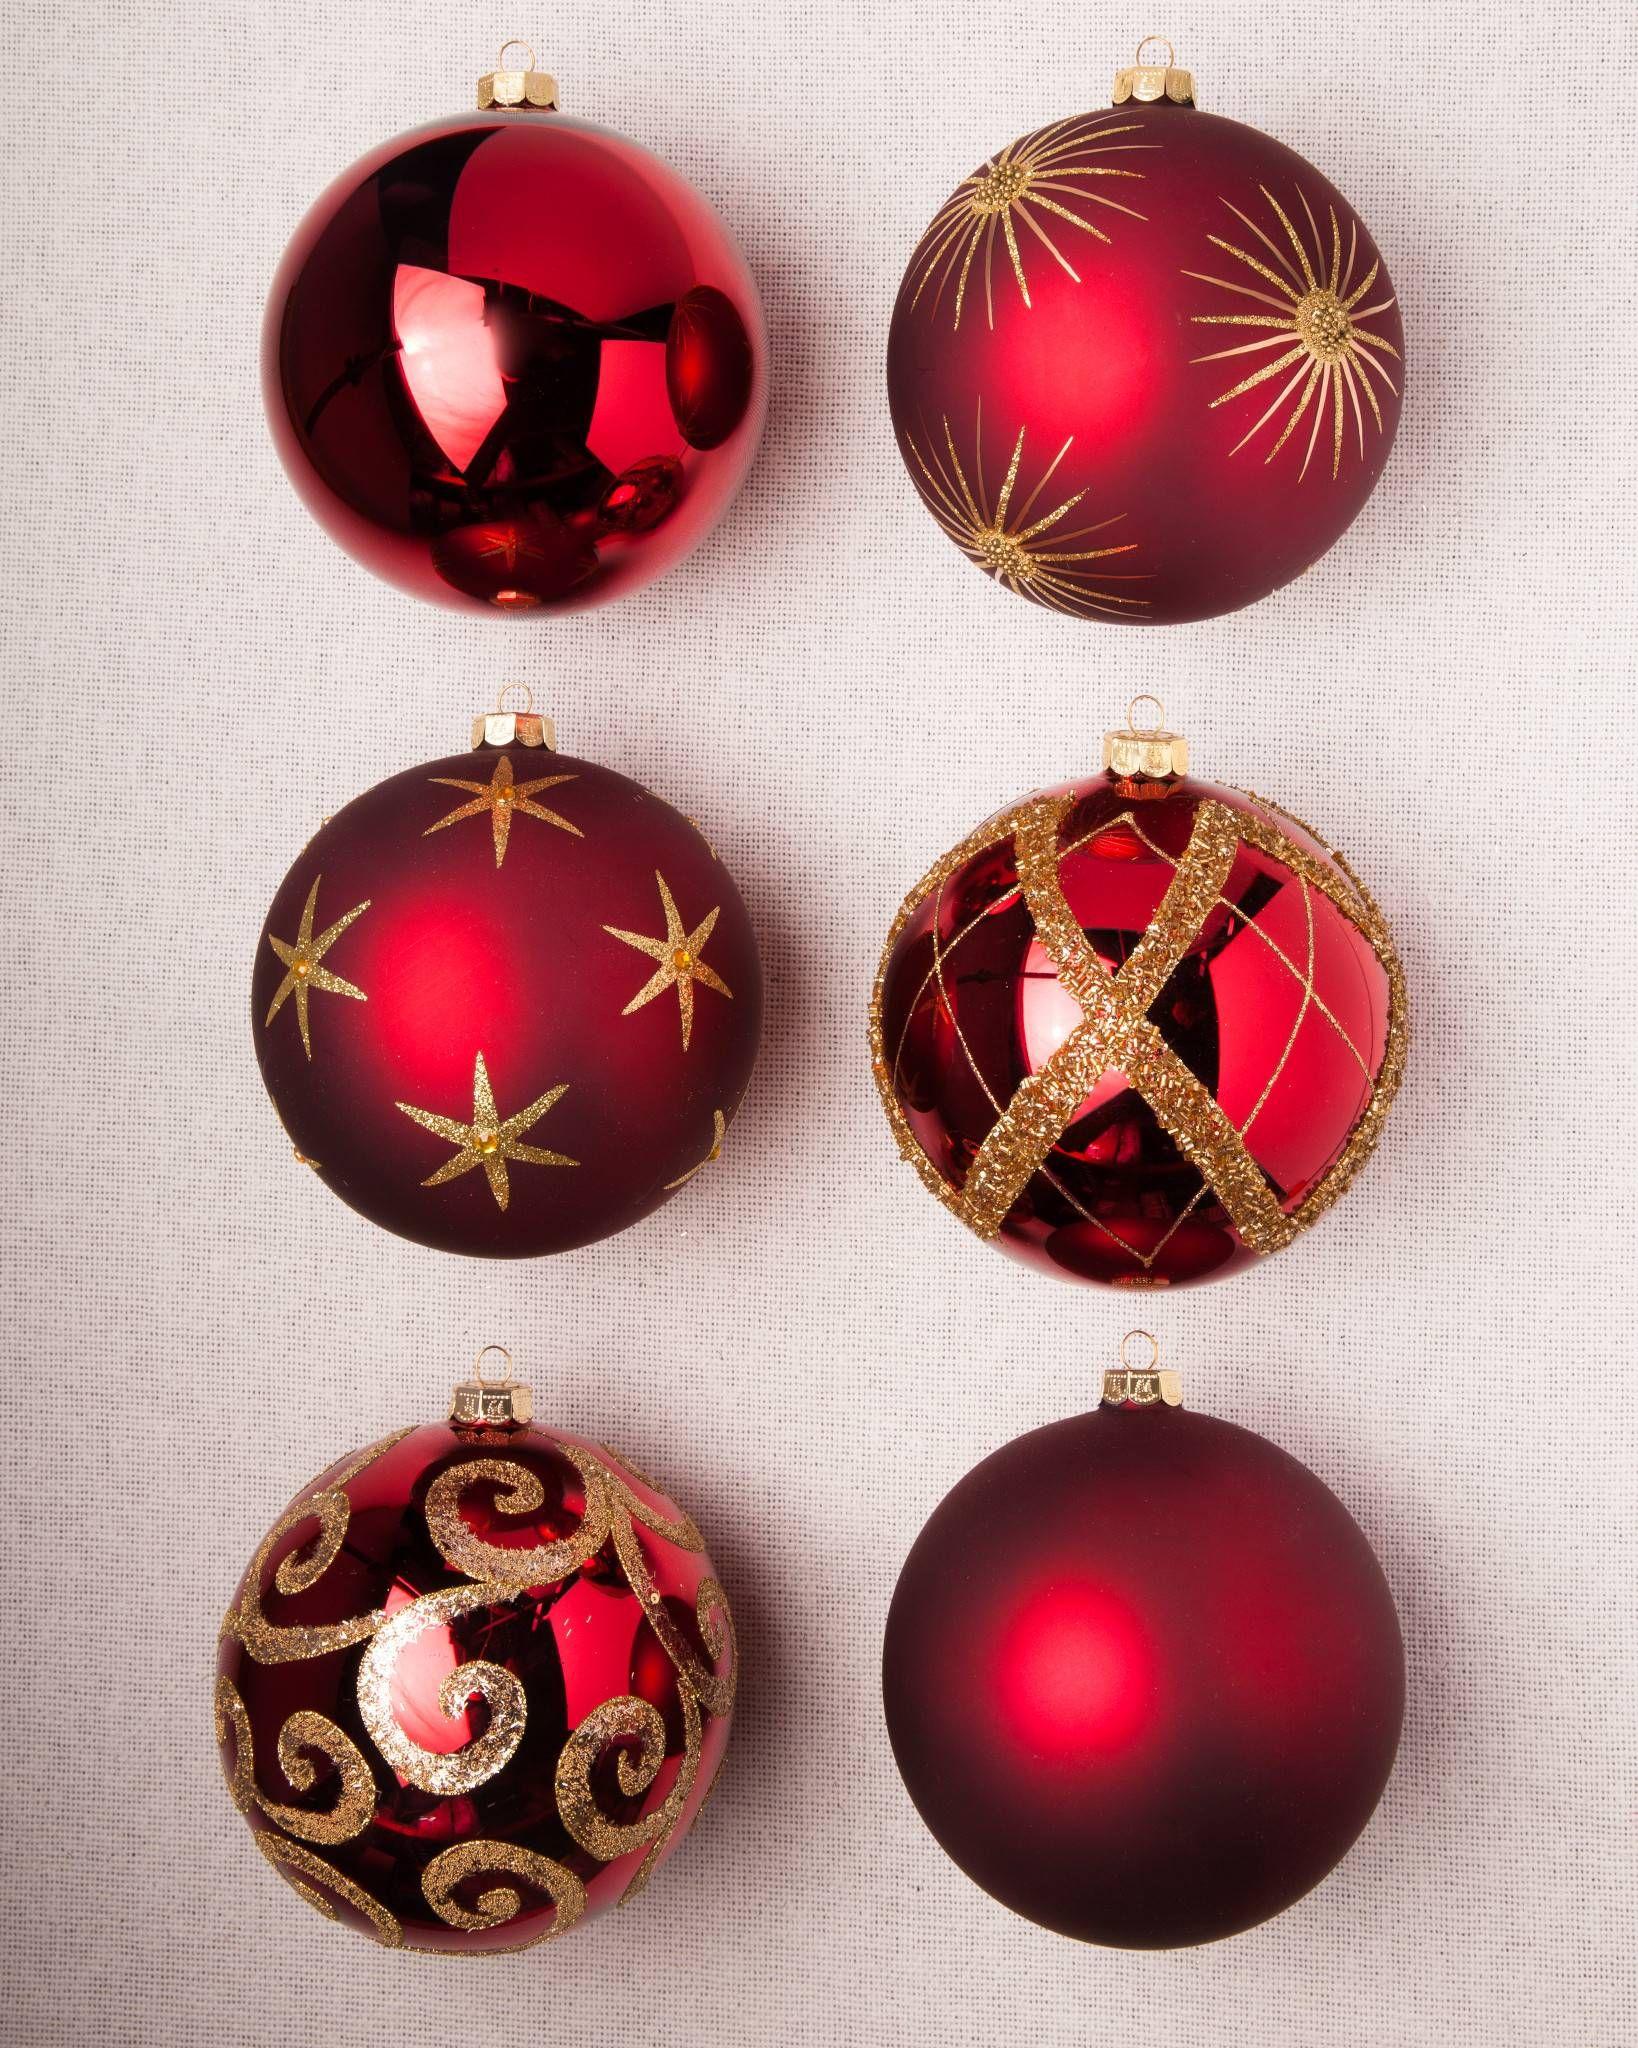 Brilliant Bordeaux Christmas Ornament Set Balsam Hill Christmas Ornament Sets Ornament Set Christmas Ornaments